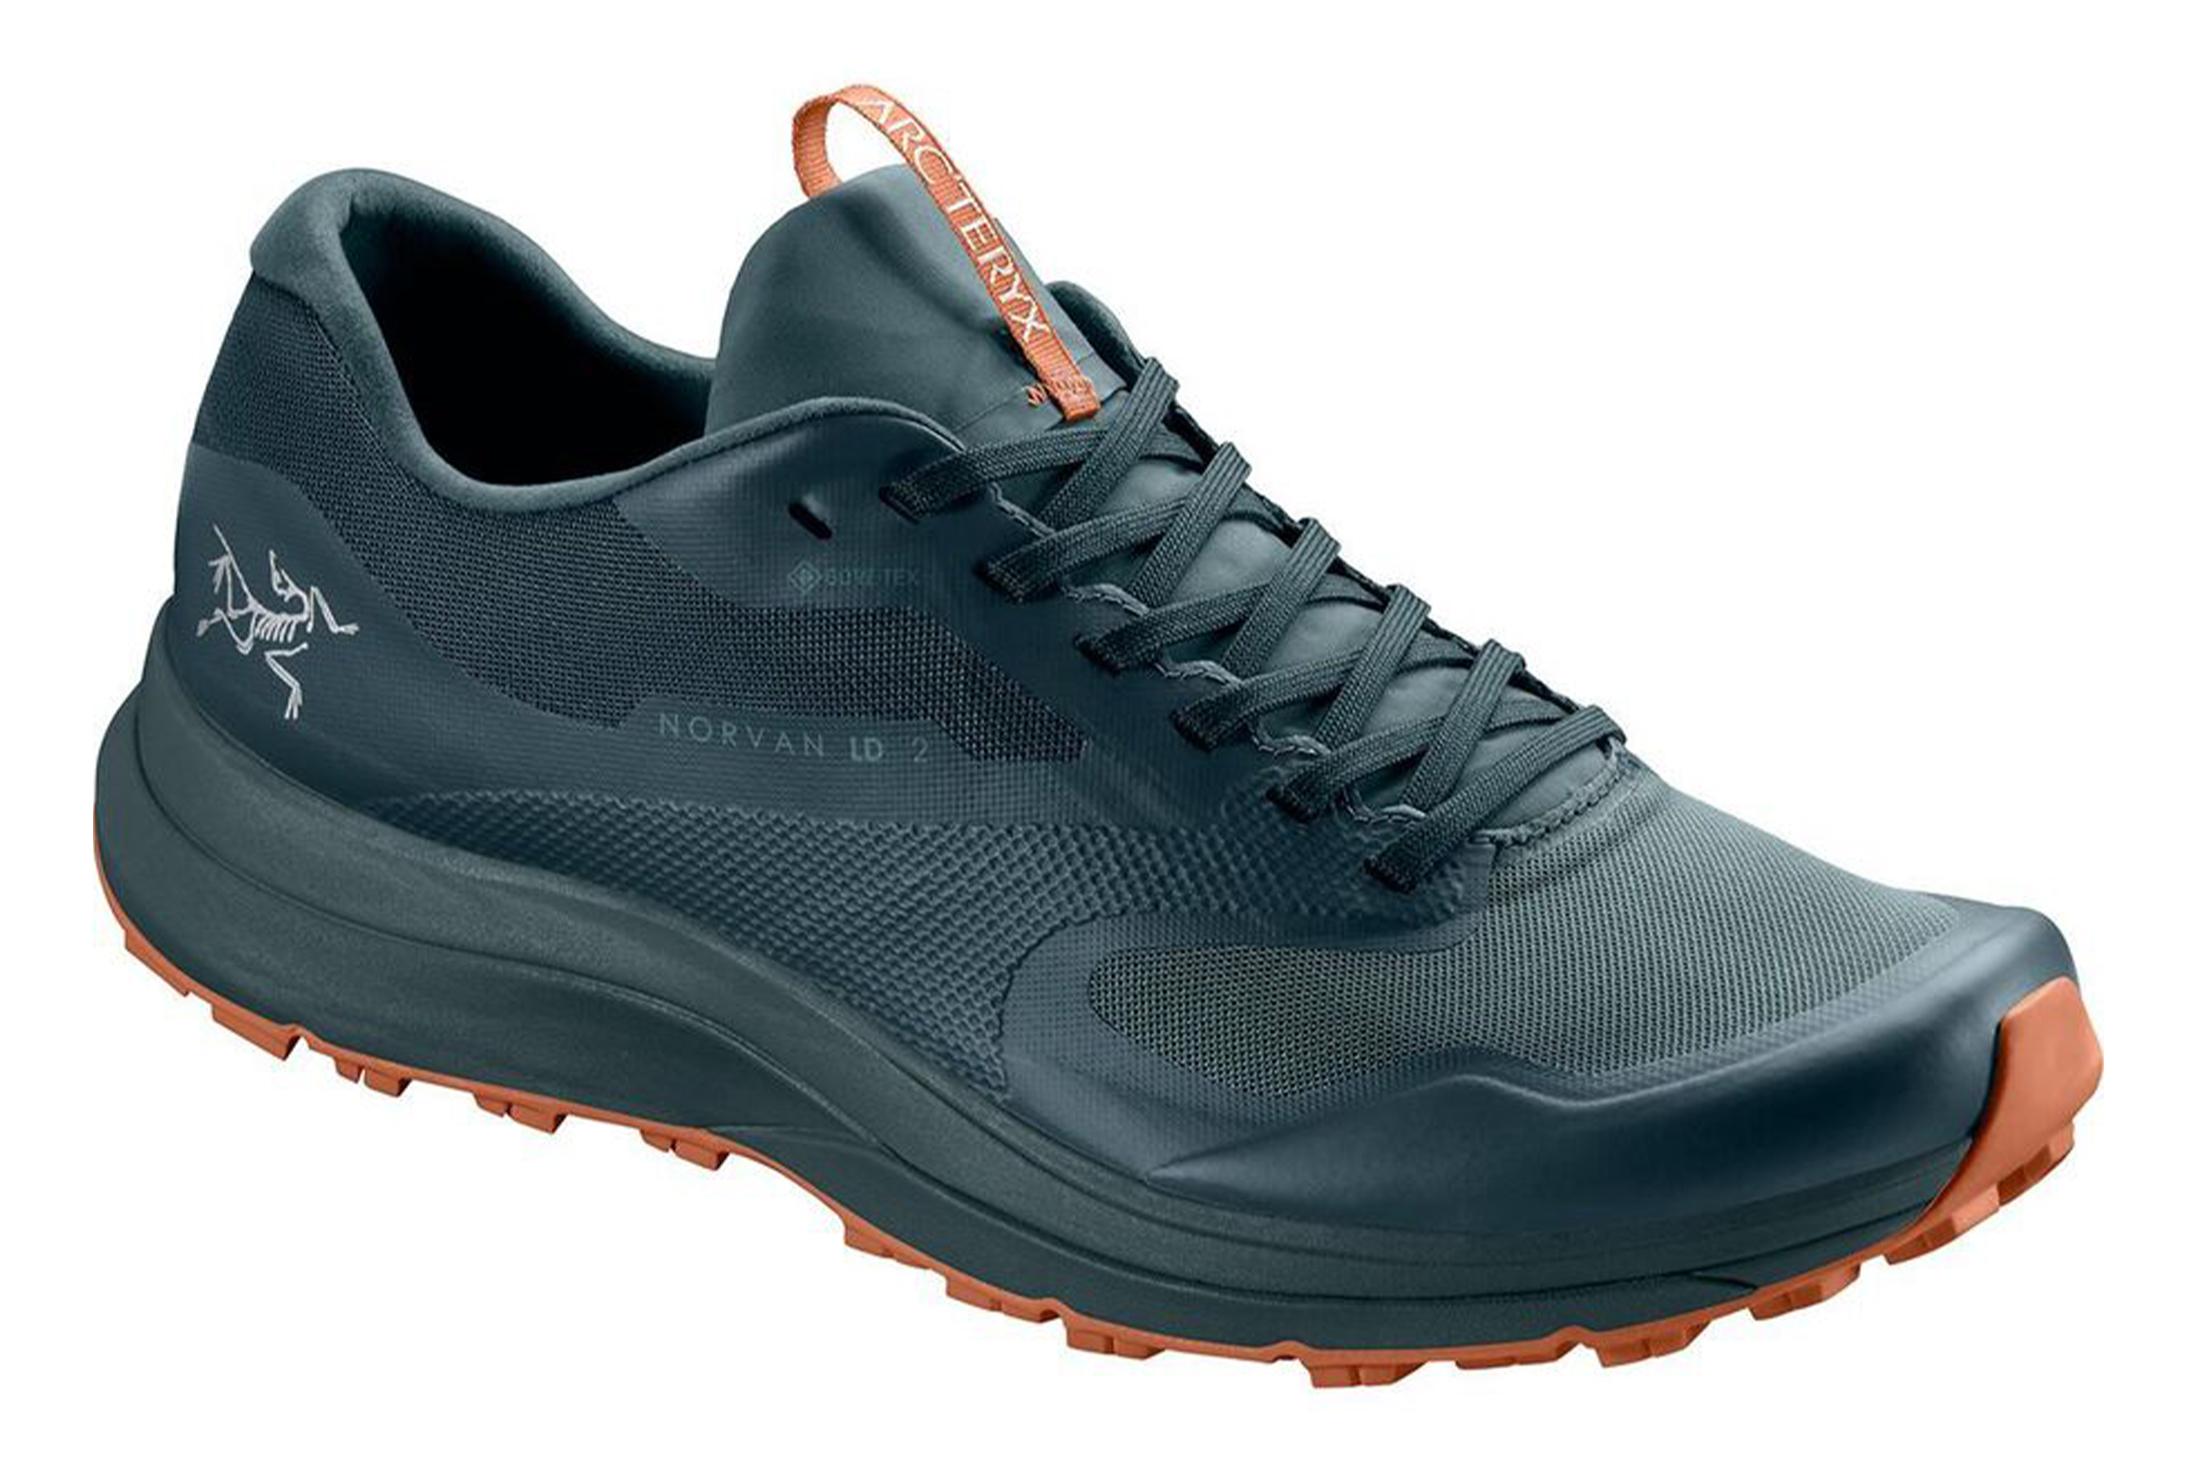 Arc'teryx Norvan LD 2 GTX Trail Running Shoes